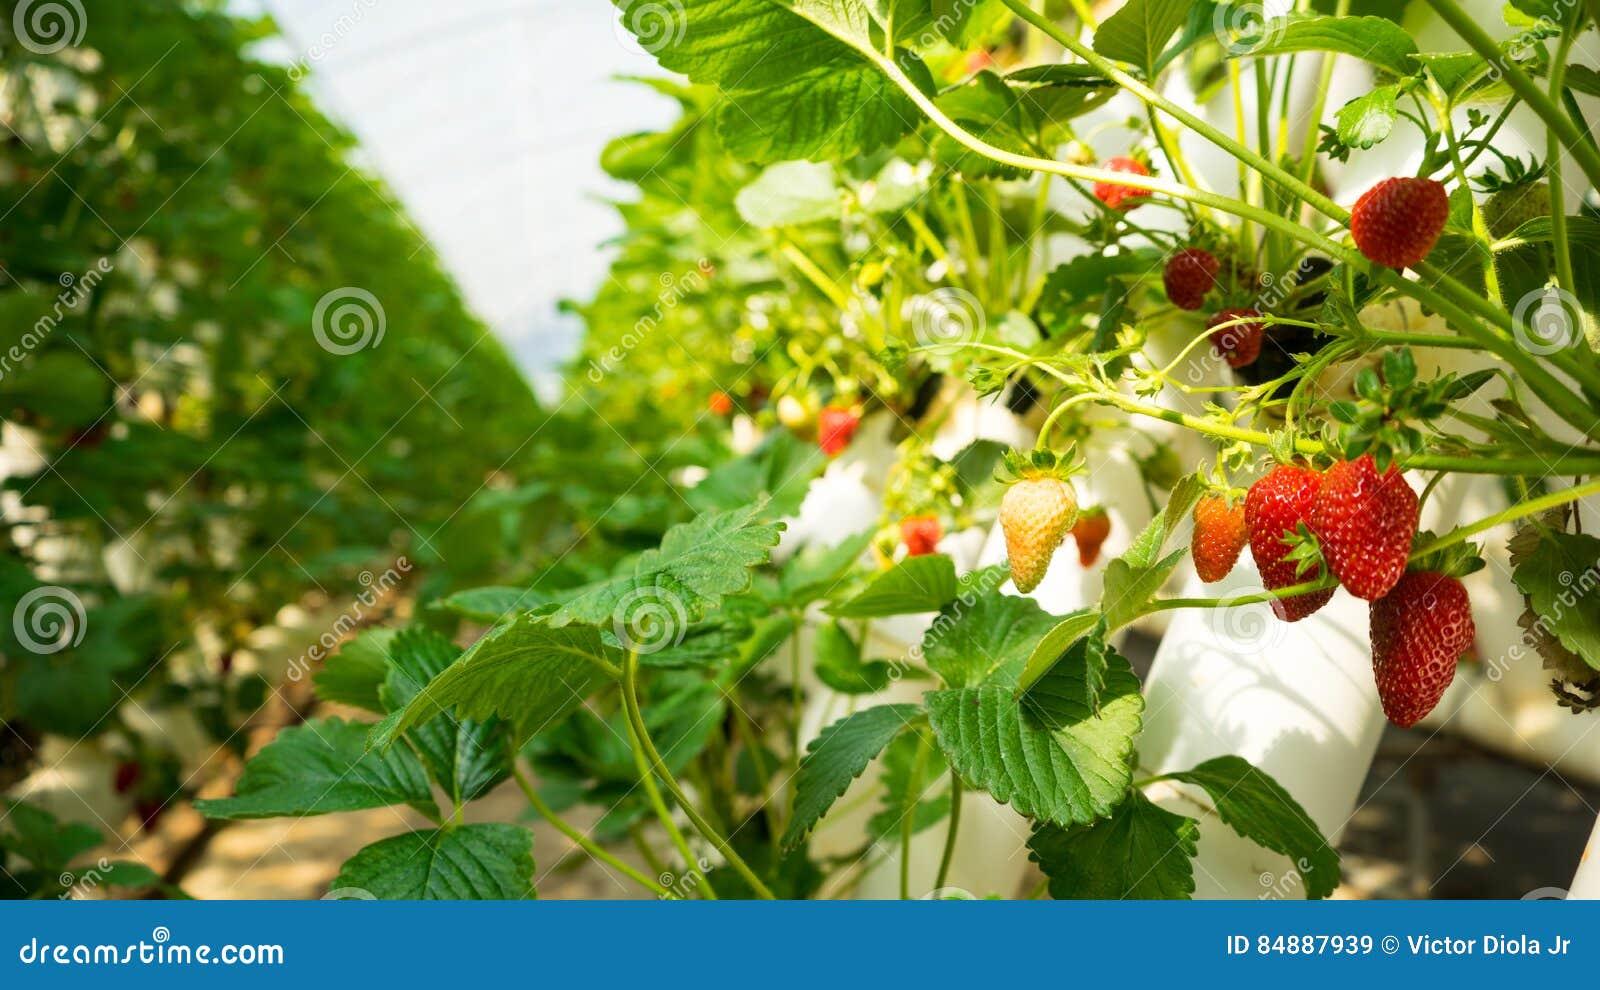 Strawberries In A Strawberry Farm